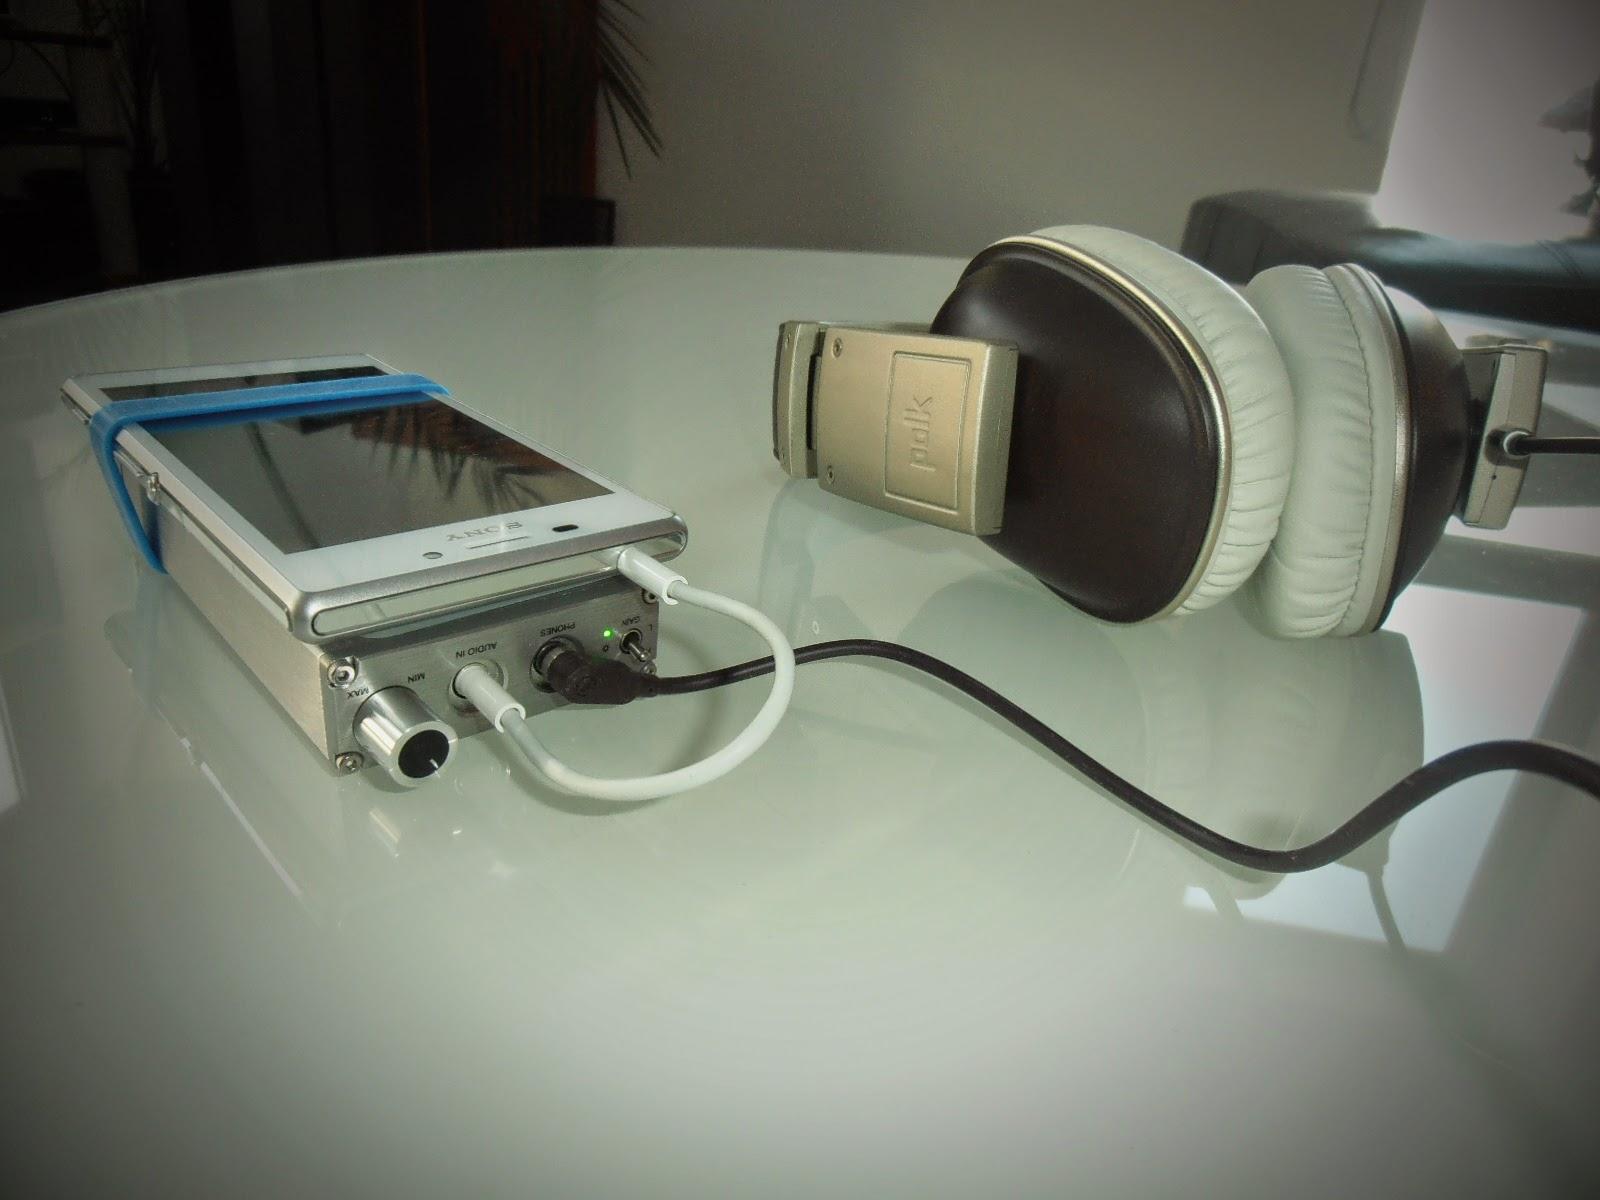 stereo i kolorowo underground s uchawki polk audio buckle oraz hifiman hm 101 karta d wi kowa. Black Bedroom Furniture Sets. Home Design Ideas